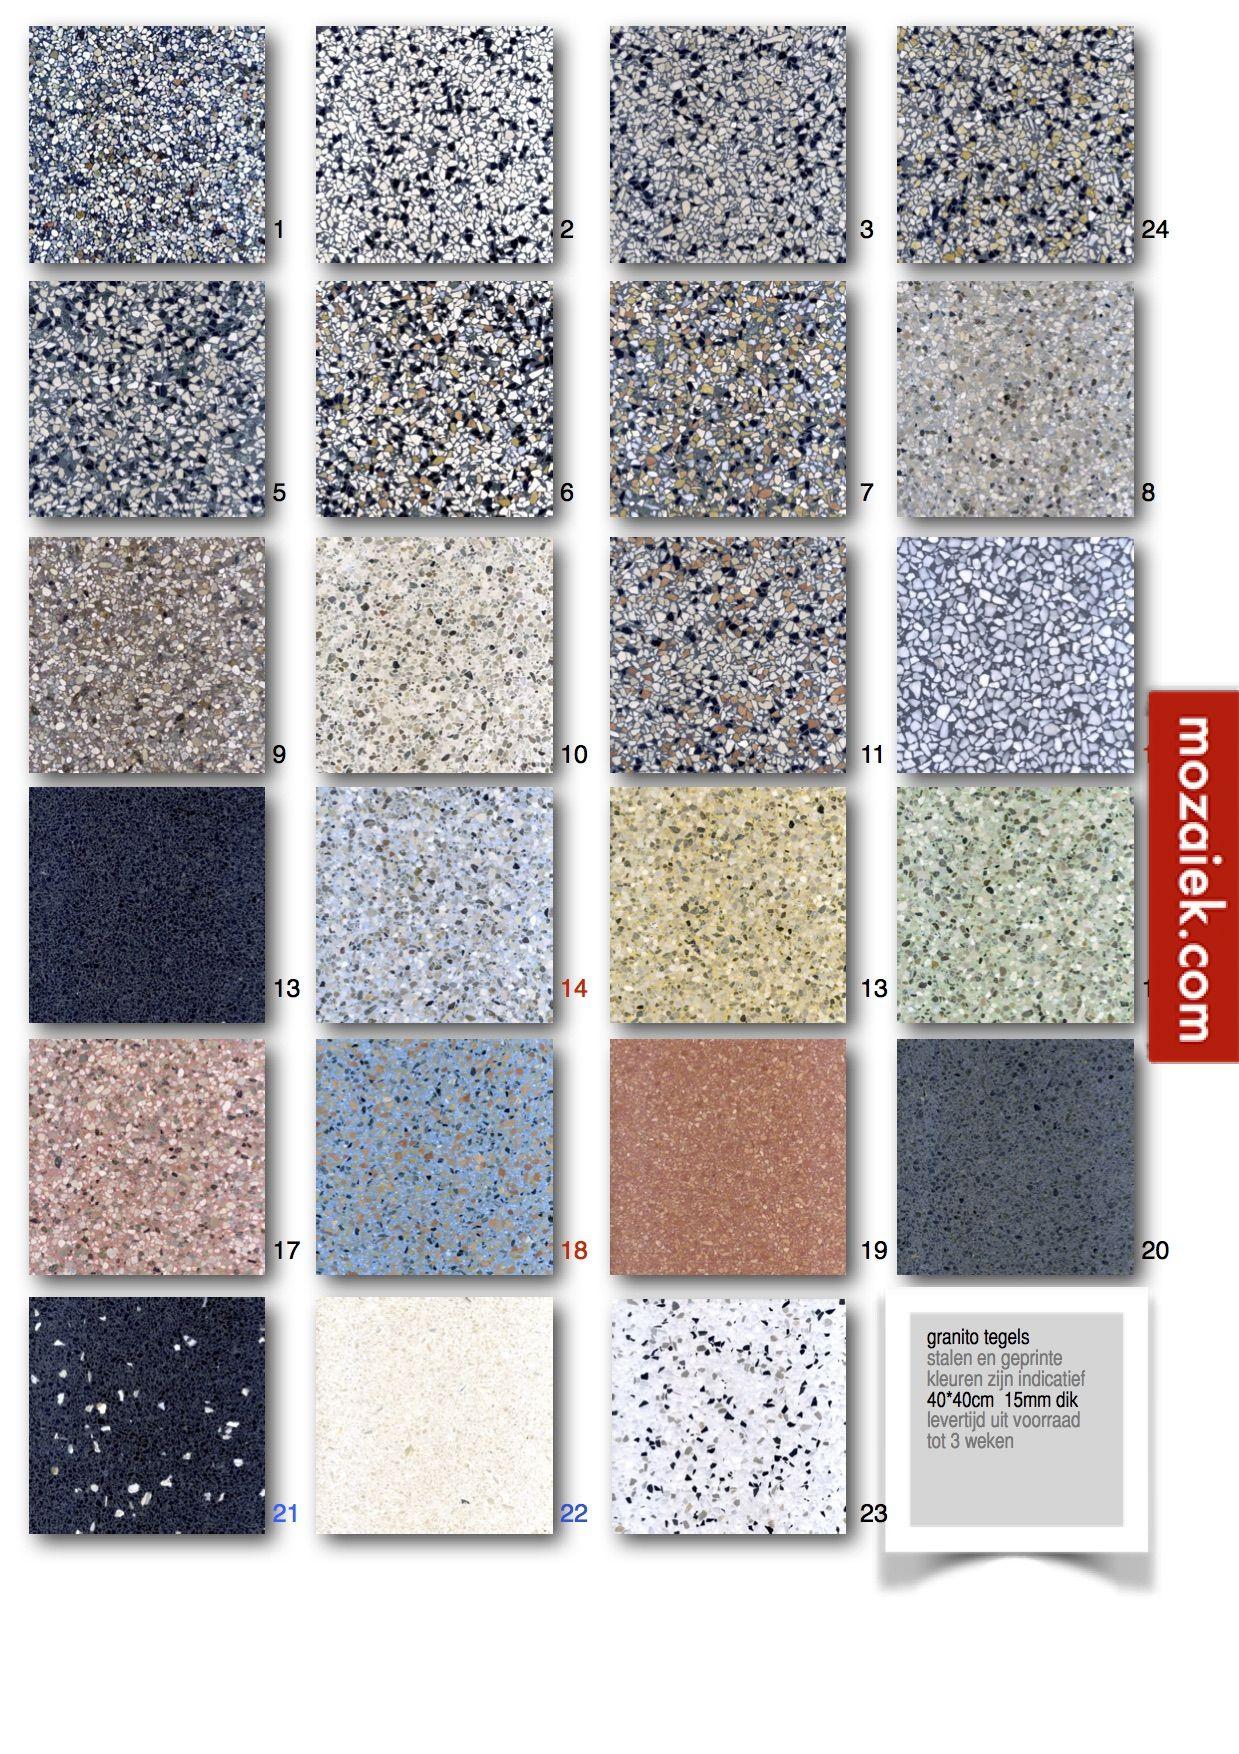 granito tegels 40x40x1,5cm | Moodboard Badkamer | Pinterest | Toilet